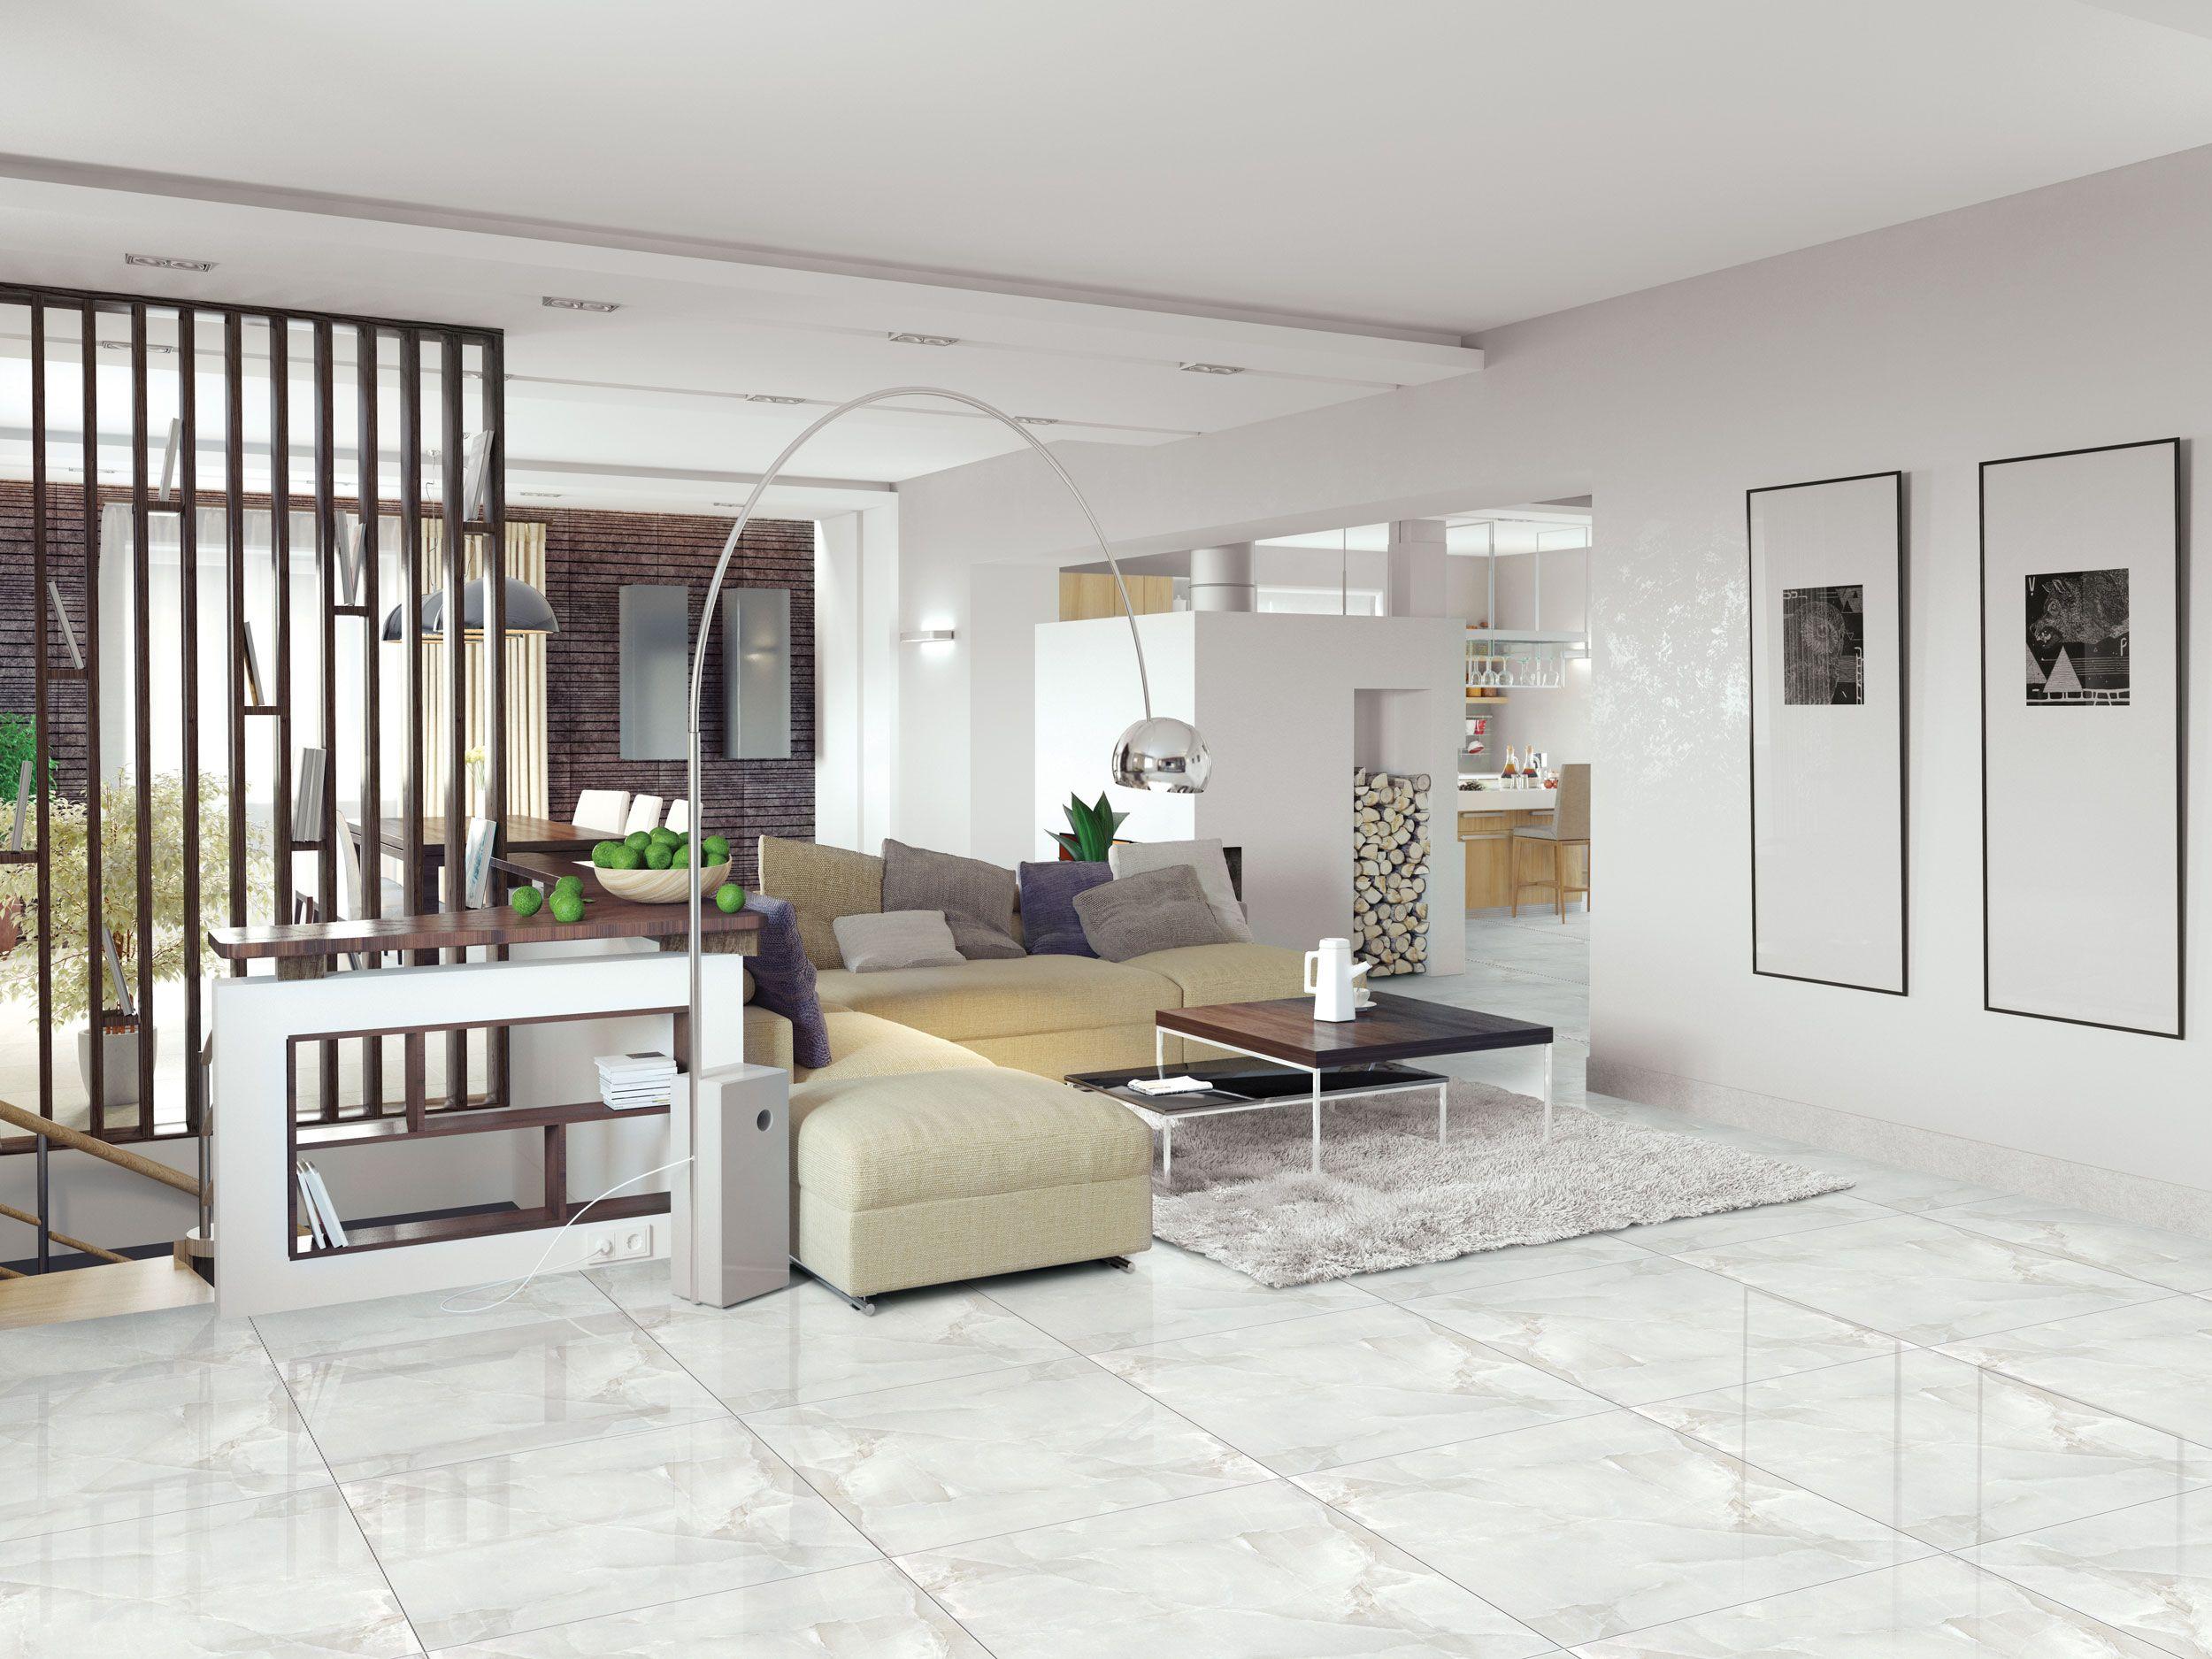 Buy Designer Floor Wall Tiles For Bathroom Bedroom Kit